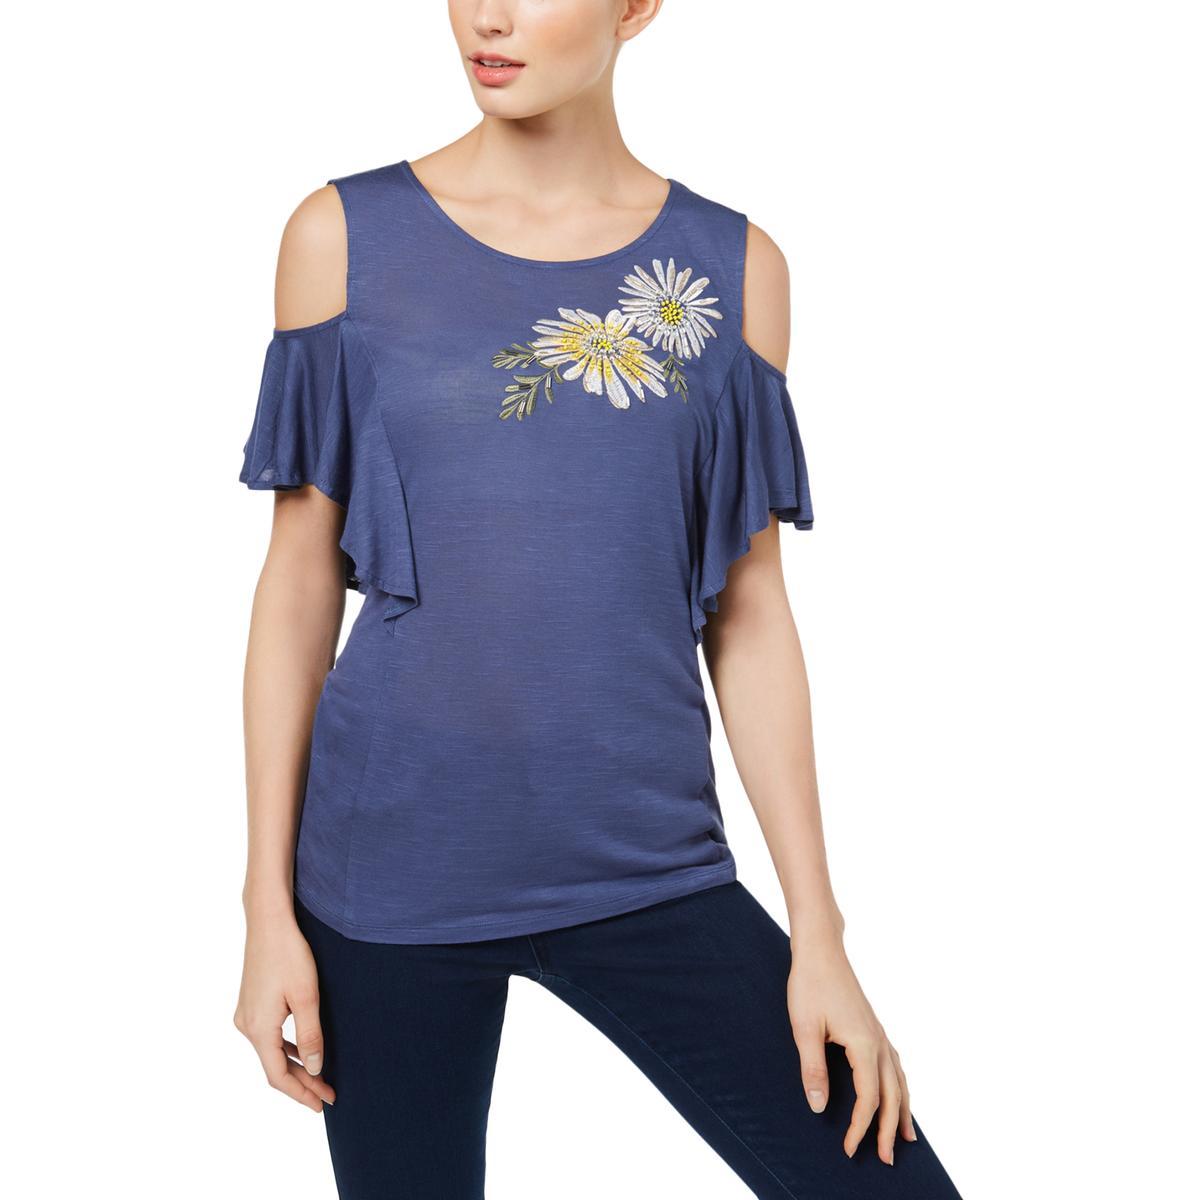 56450bbc42bde Details about INC Womens Knit Floral Cold Shoulder Pullover Top Blouse BHFO  5381